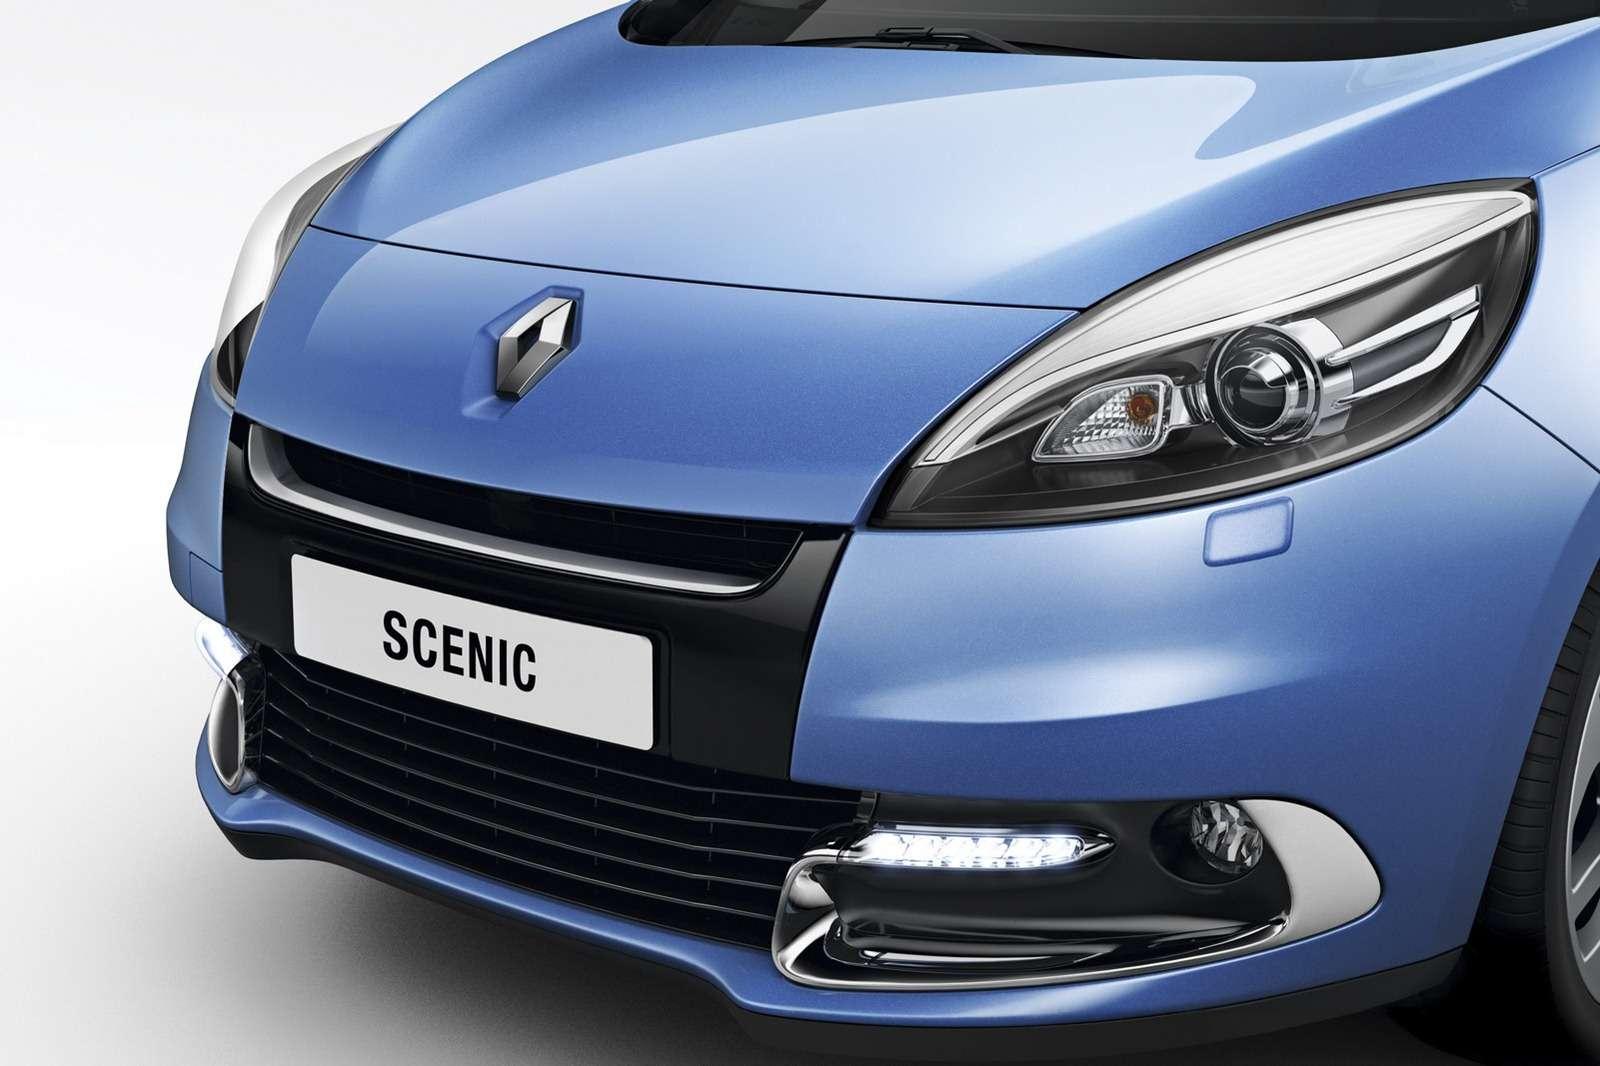 Renault Scenic Grand Scenic 2012 rok styczen 2012